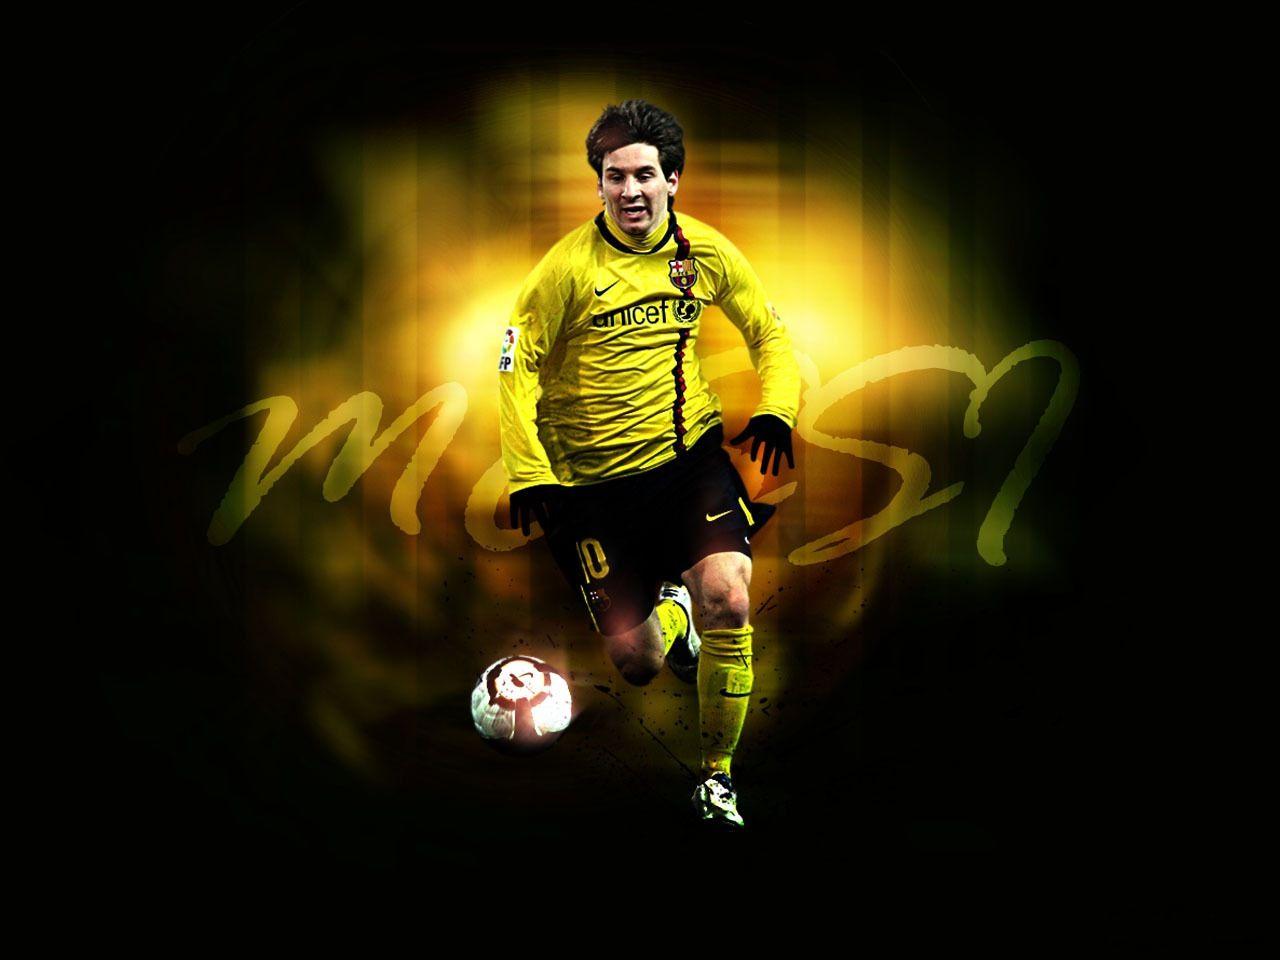 Cool Footballer Hd Cool Wallpaper Background Lionel Messi